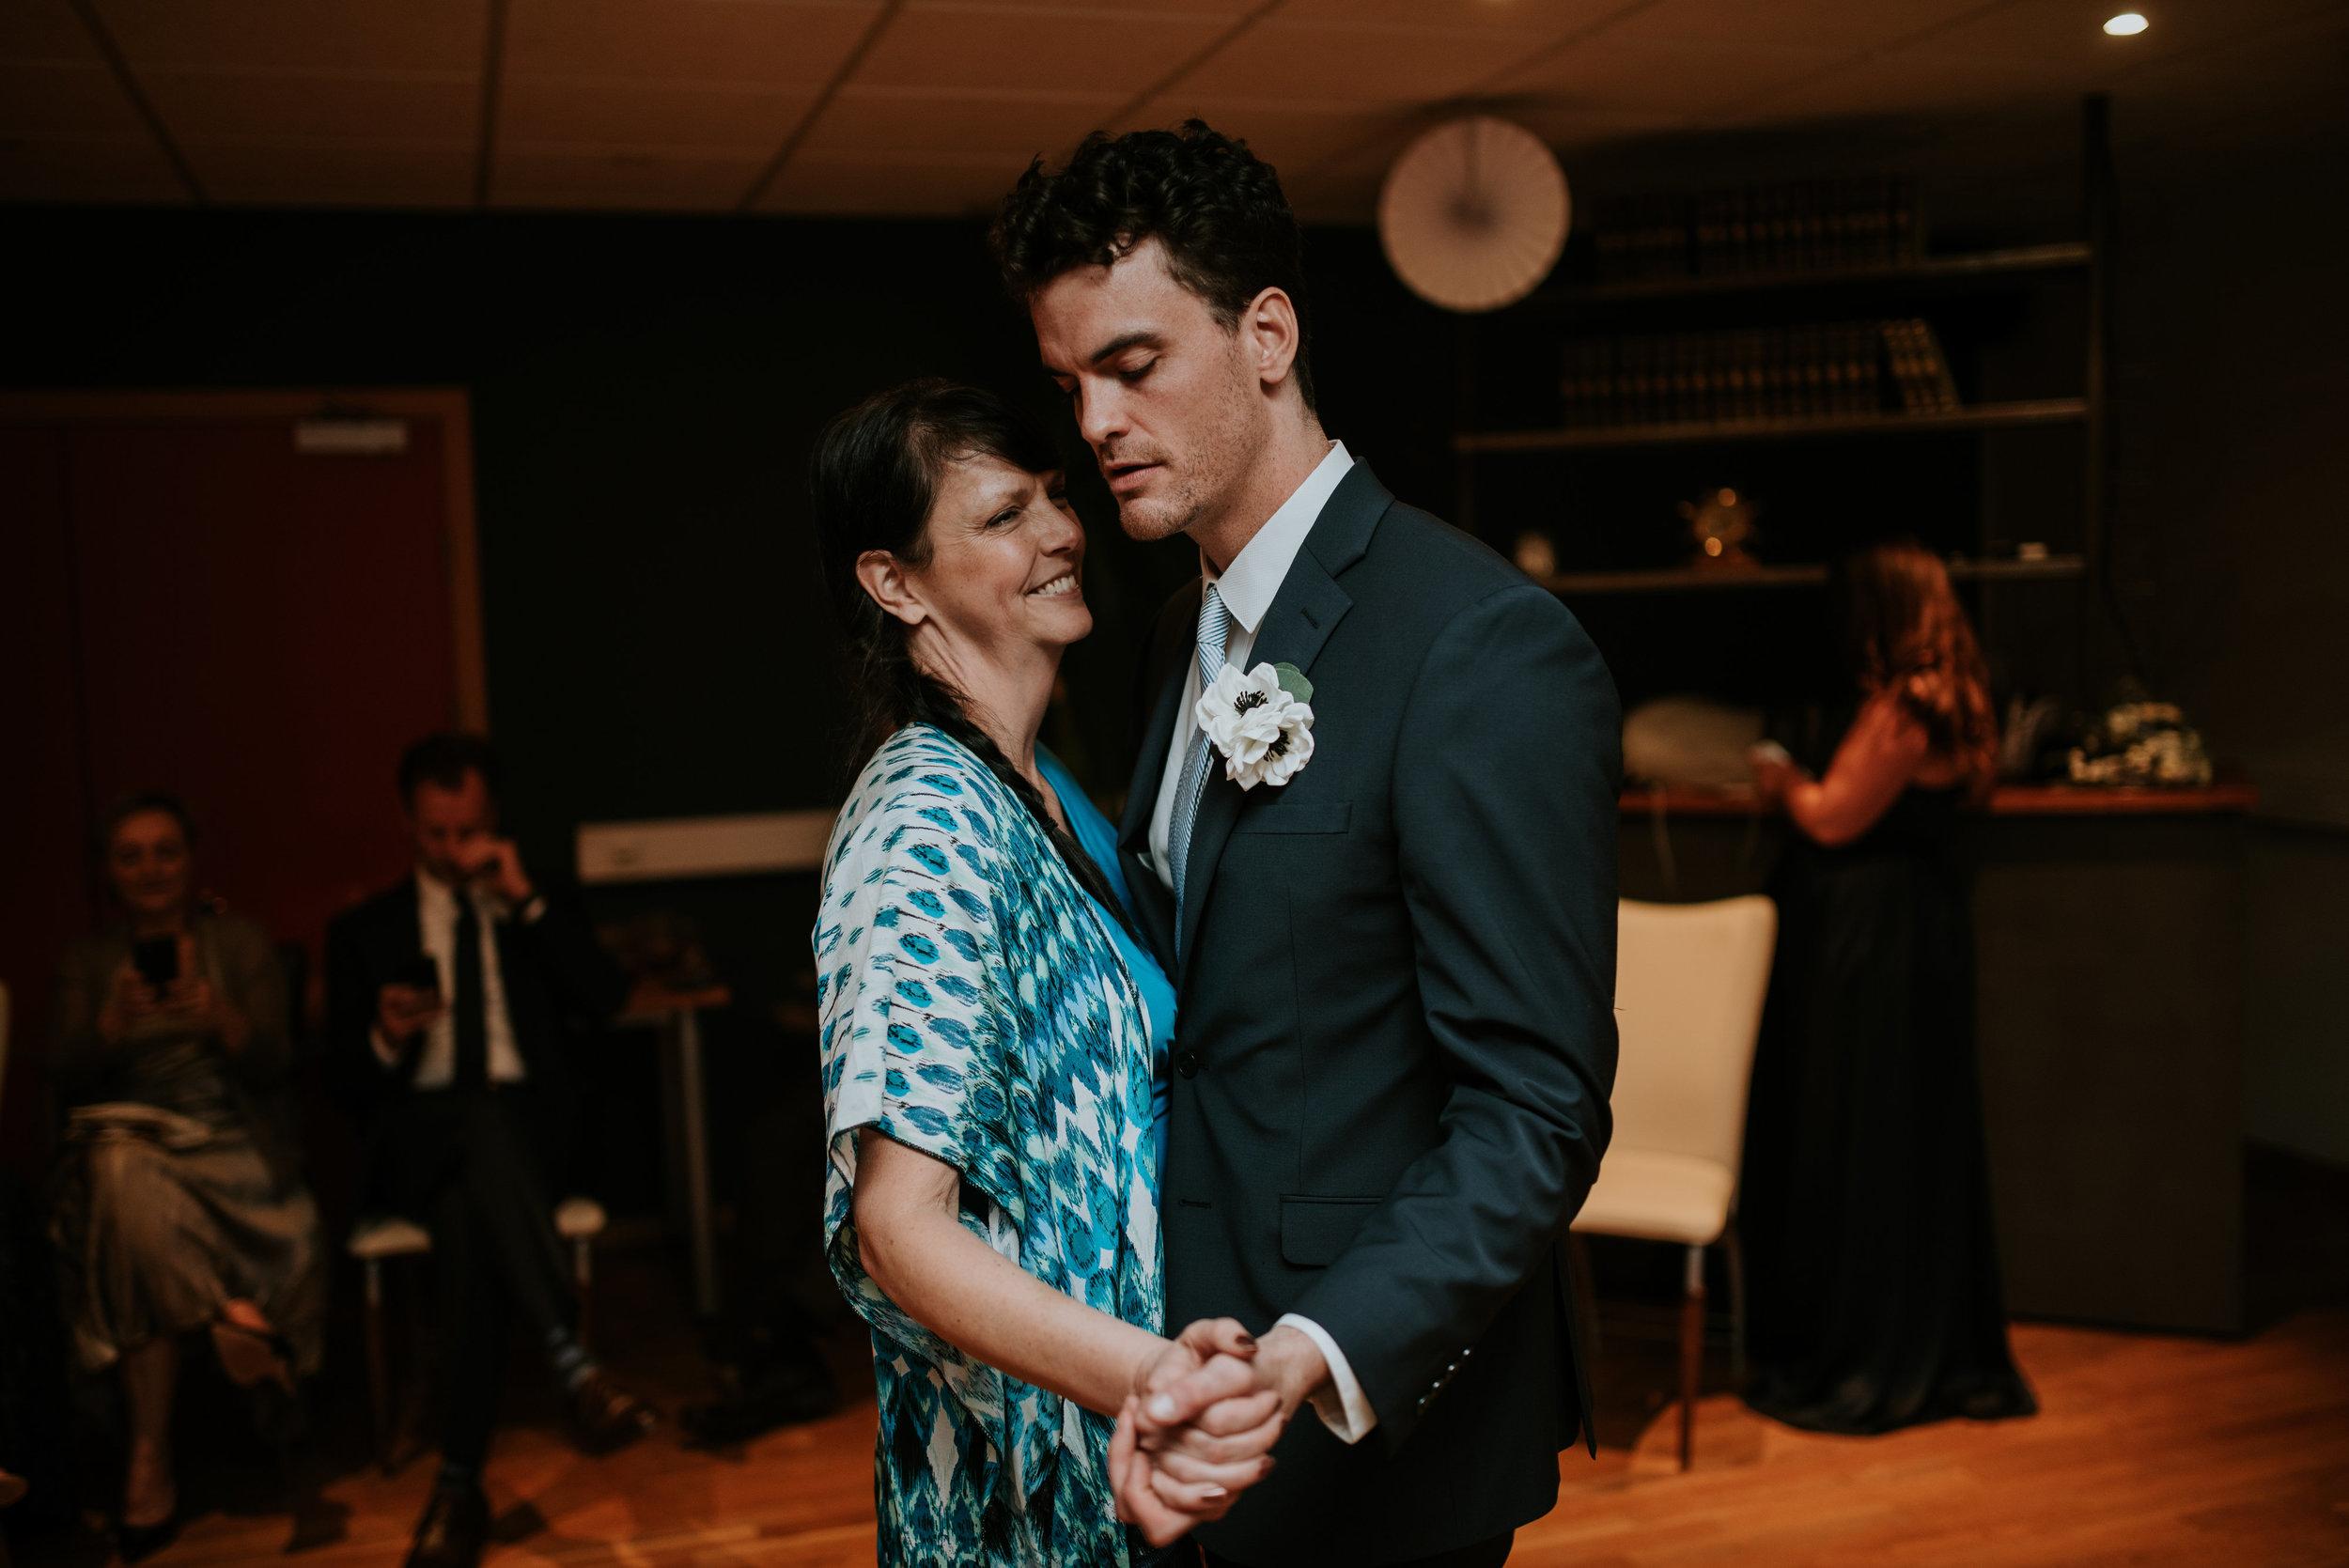 Mckenna + Nic Wedding (2)-0516.jpg